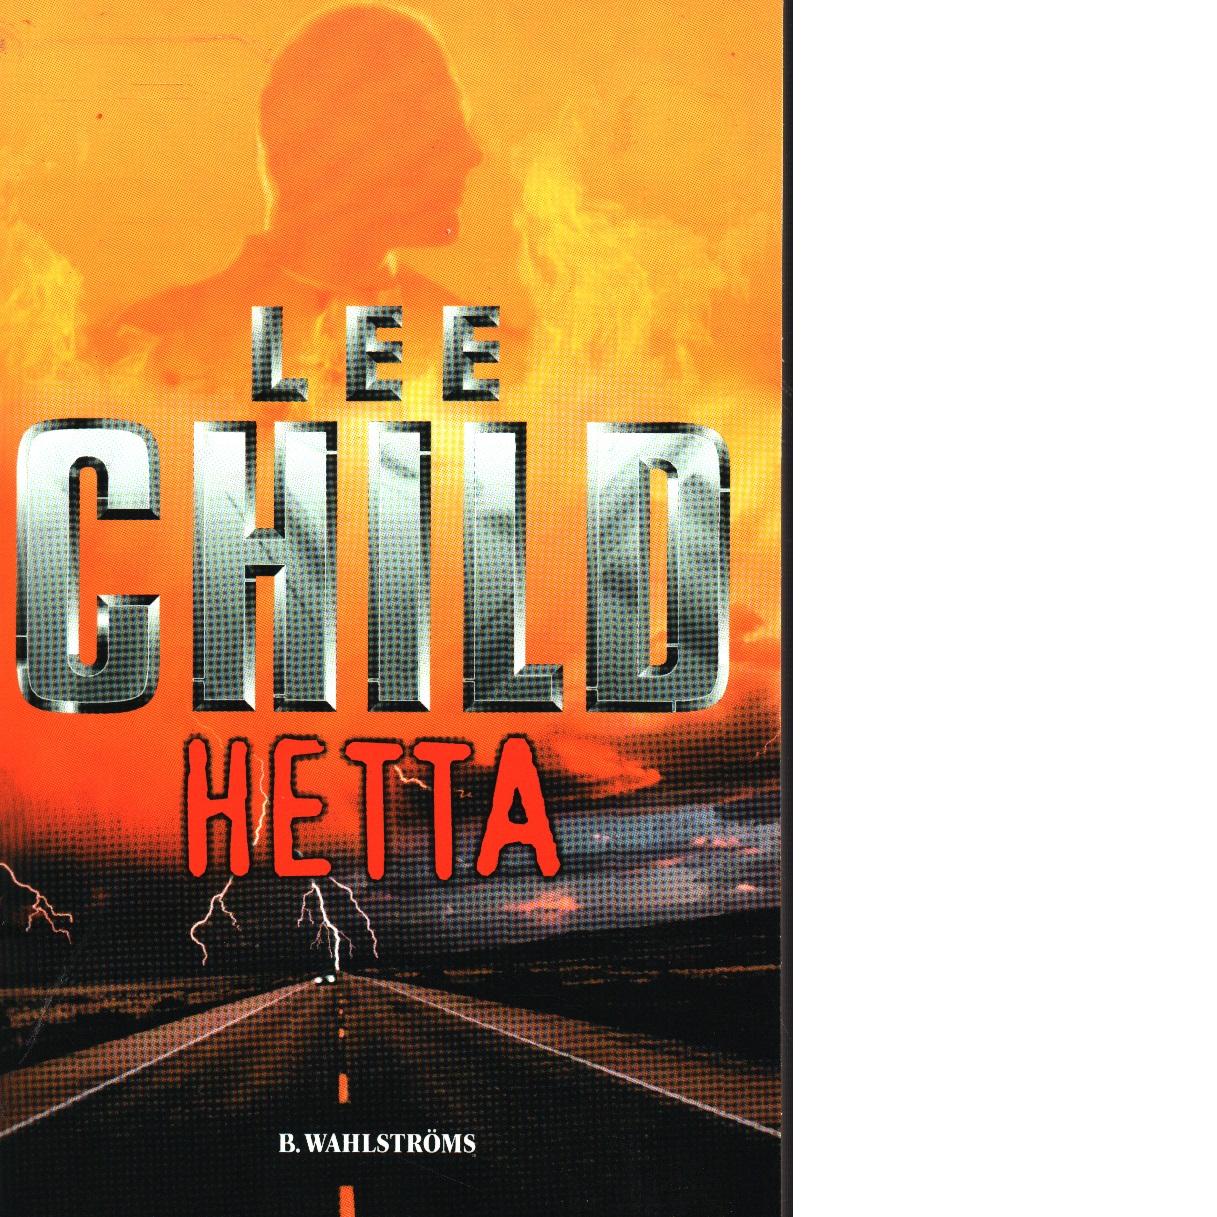 Hetta - Child, Lee